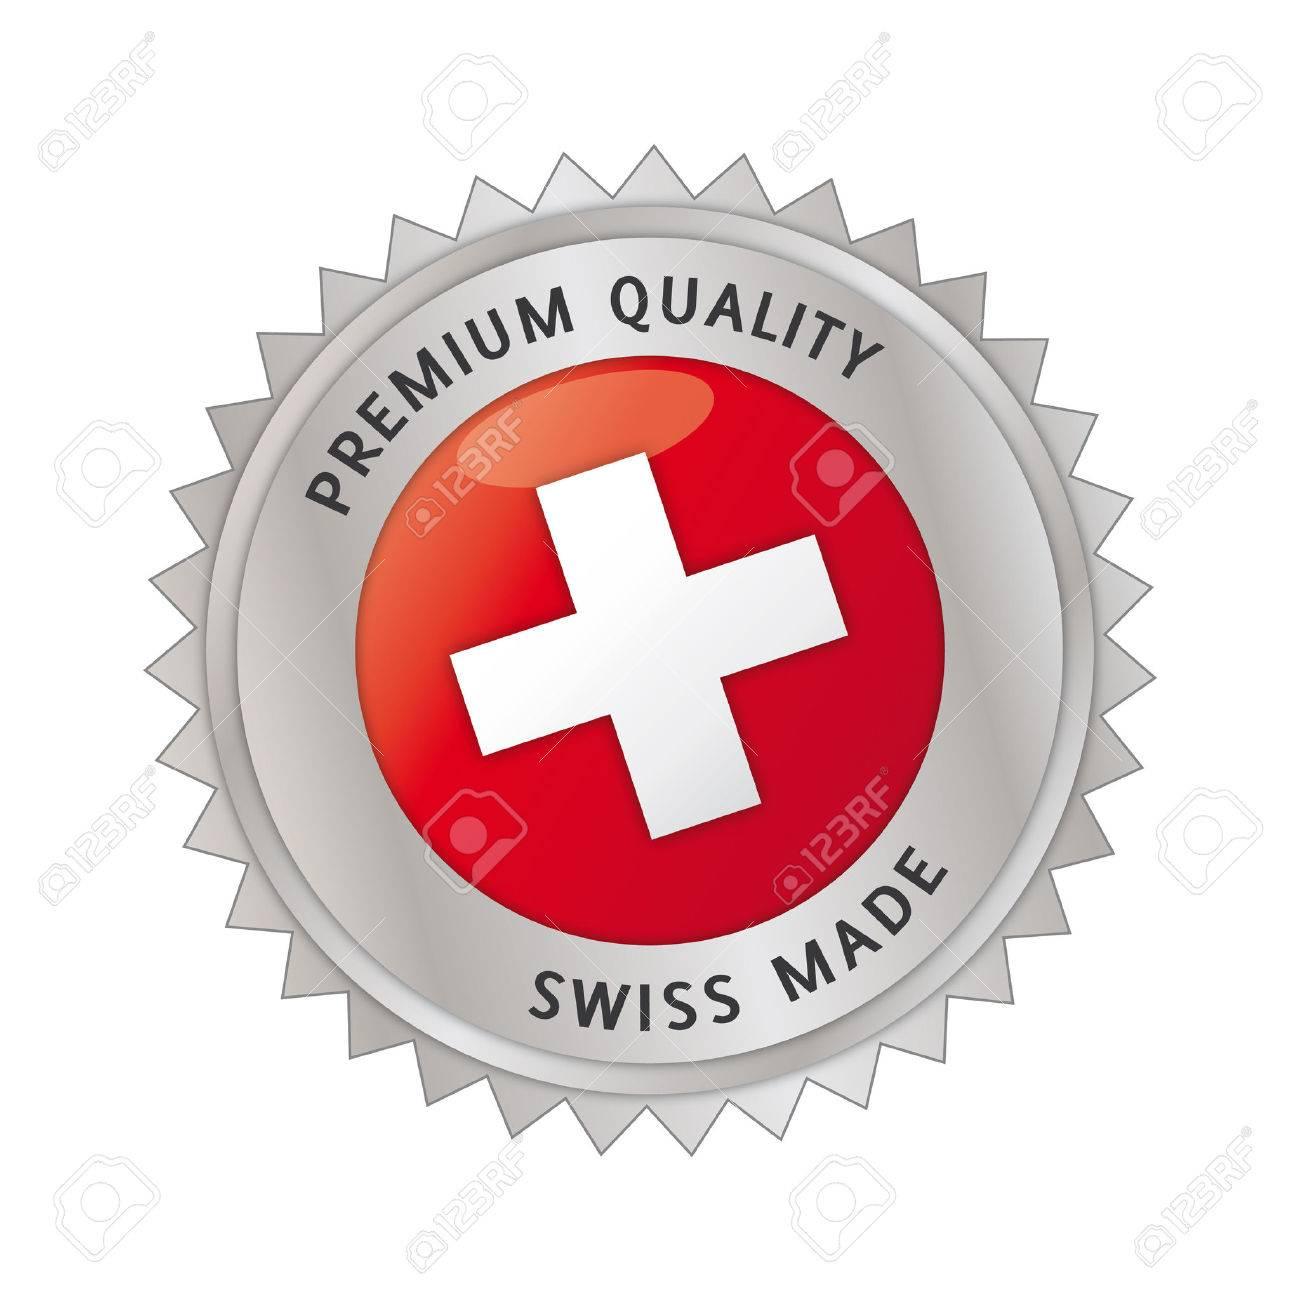 Risultati immagini per made in suisse